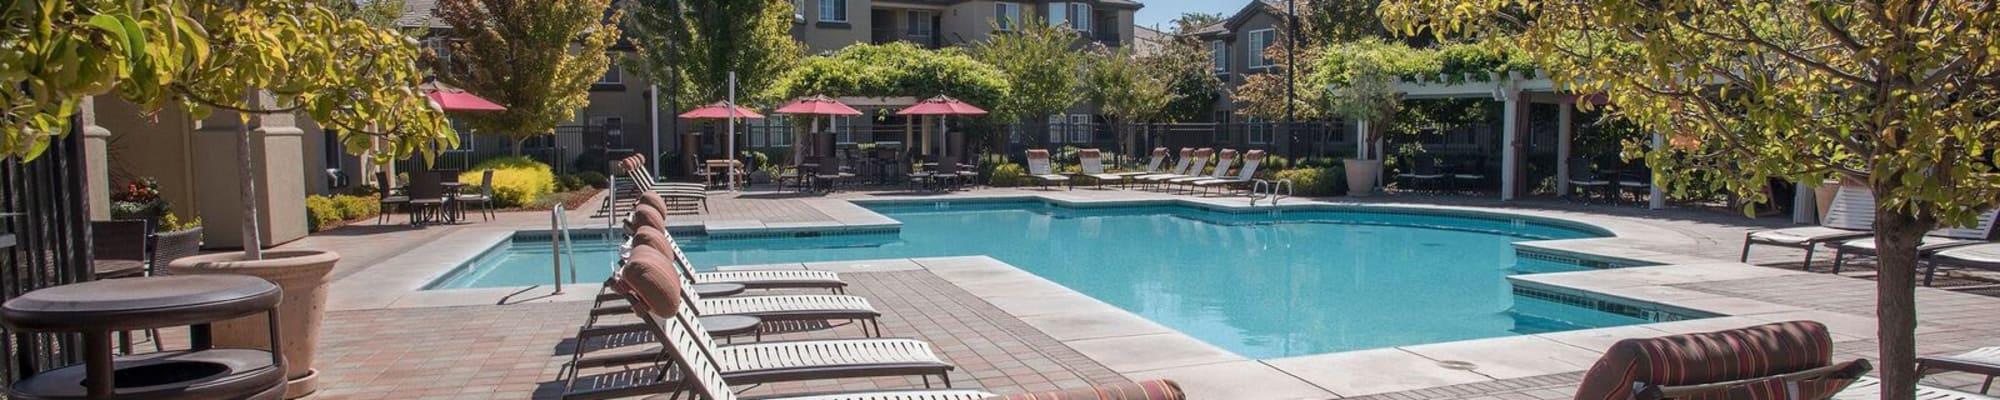 Resident perks at The Artisan Apartment Homes in Sacramento, California